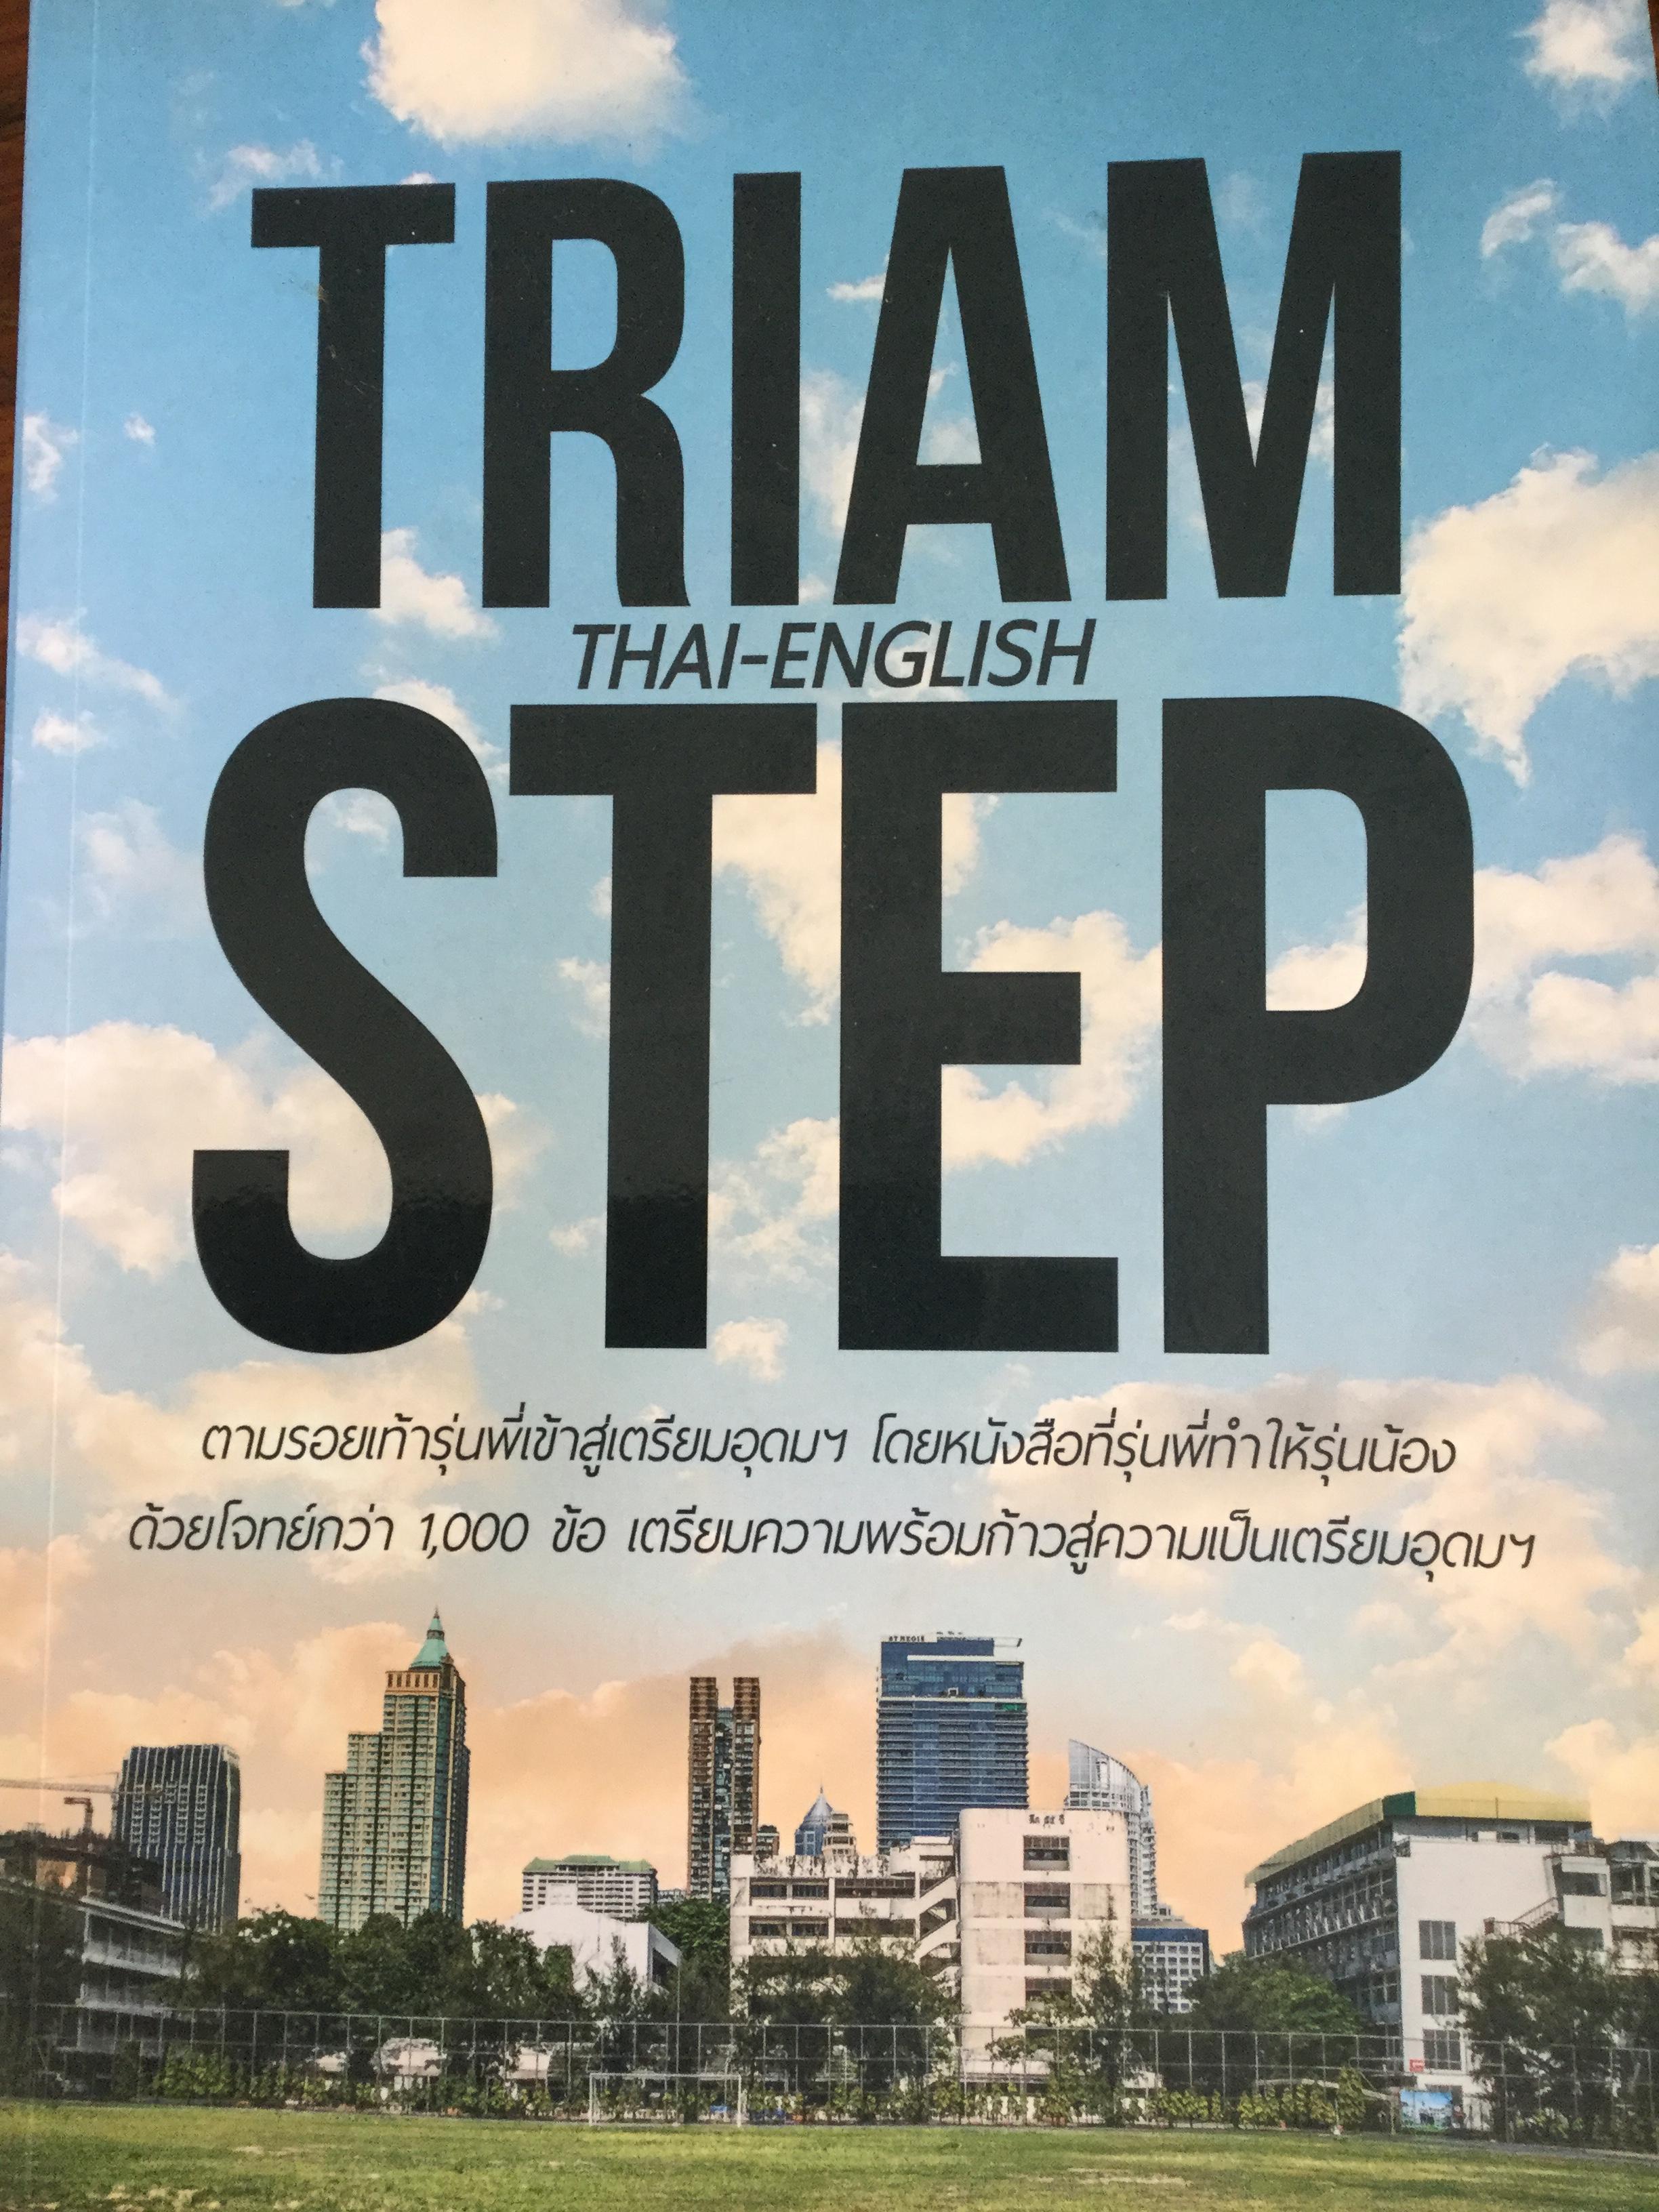 TRIAM STEP Thai-English คู่มือสอบเข้า ร.ร.เตรียมอุดมฯ มีโจทย์กว่า 1,000 ข้อ เตรียมความพร้อมก้าวสู่ความเป็นเตรียมอุดมฯ